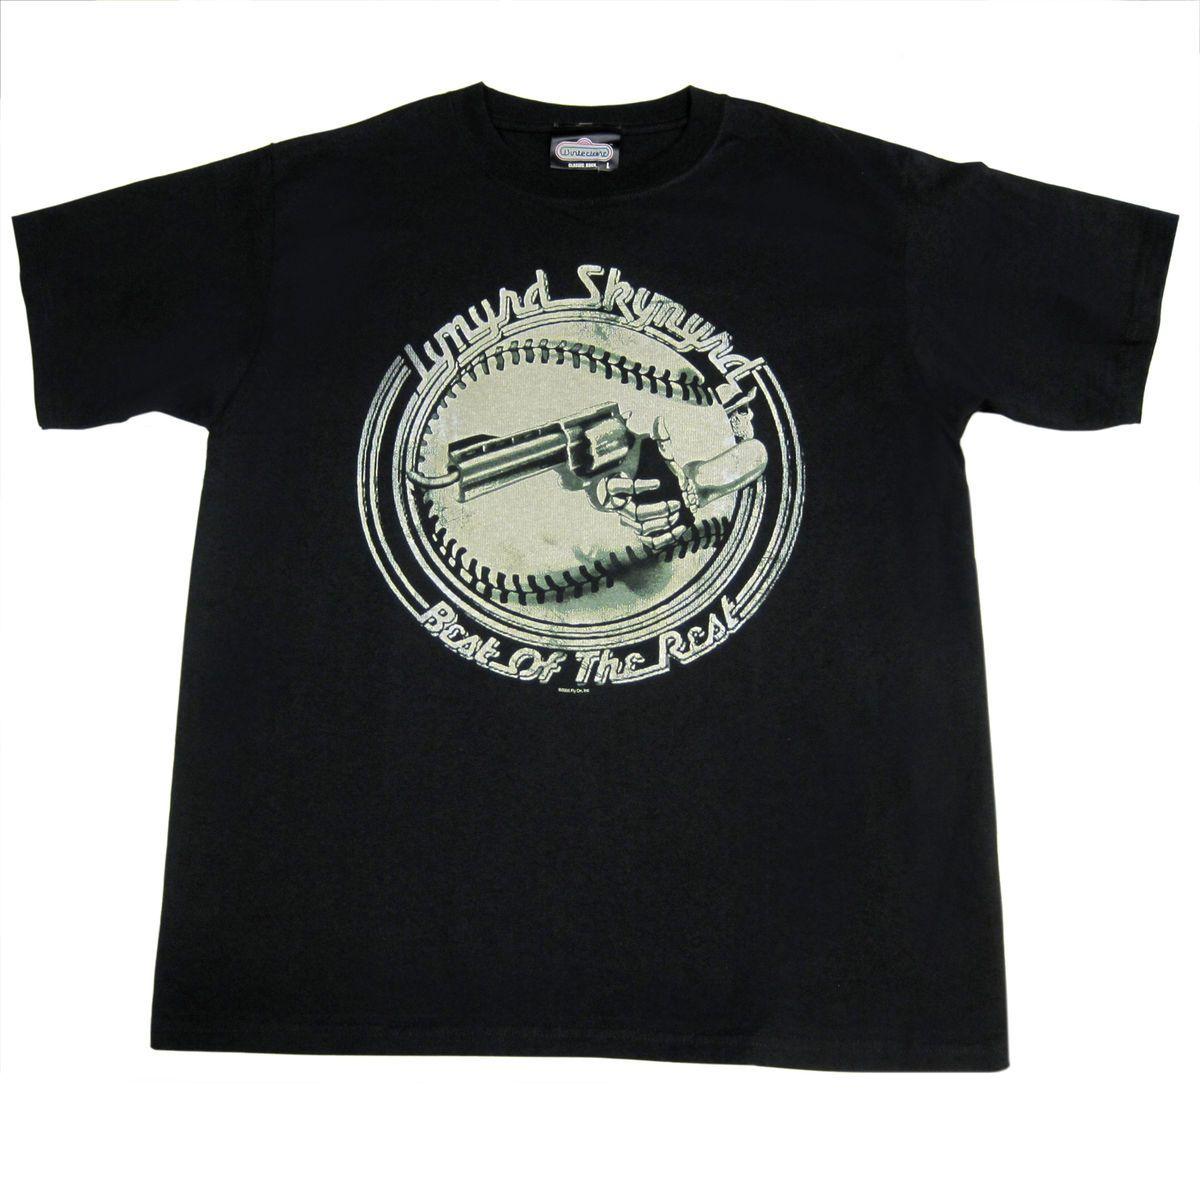 Lynyrd Skynyrd Best of The Rest T Shirt Mens Adult Large Tee Black New